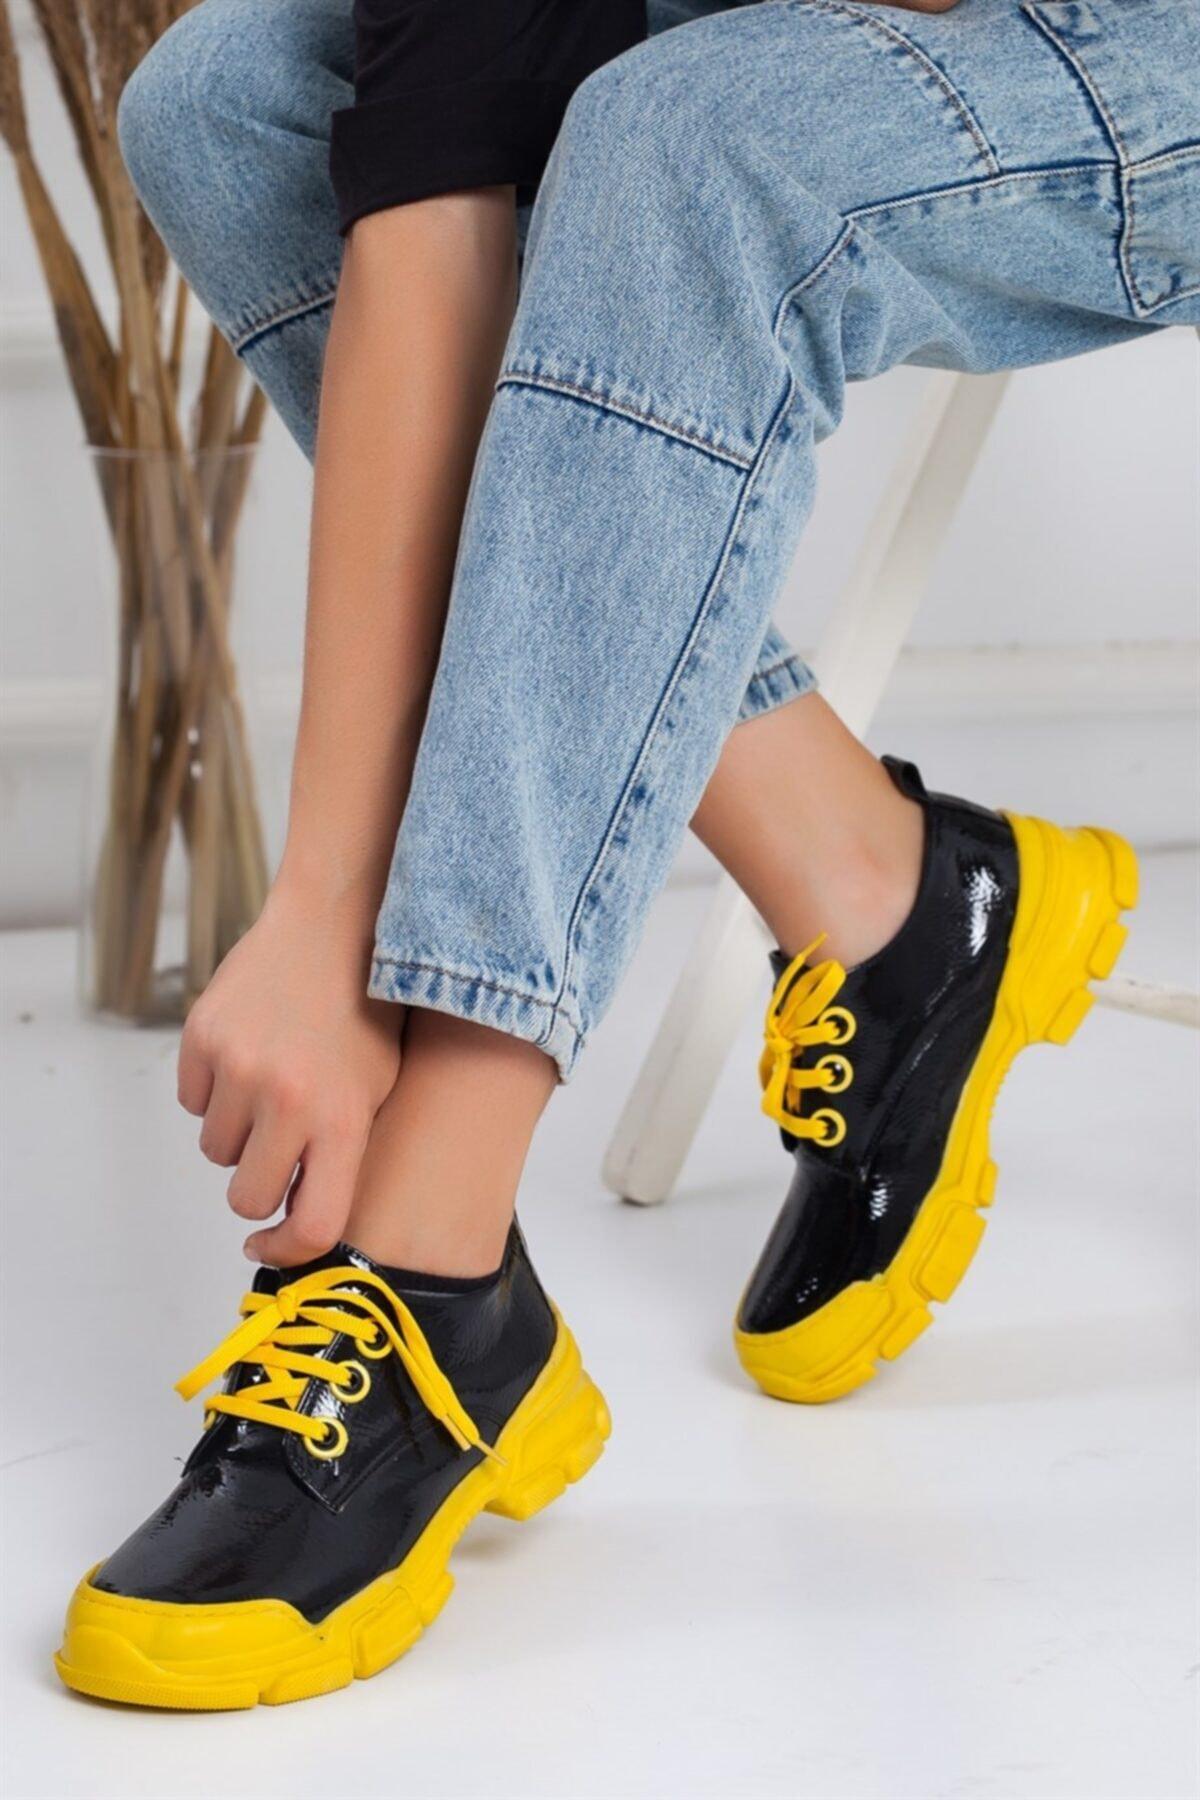 Lovita Shoes Kadın Siyah Sarı Reny Kırışık Rugan Sneakers